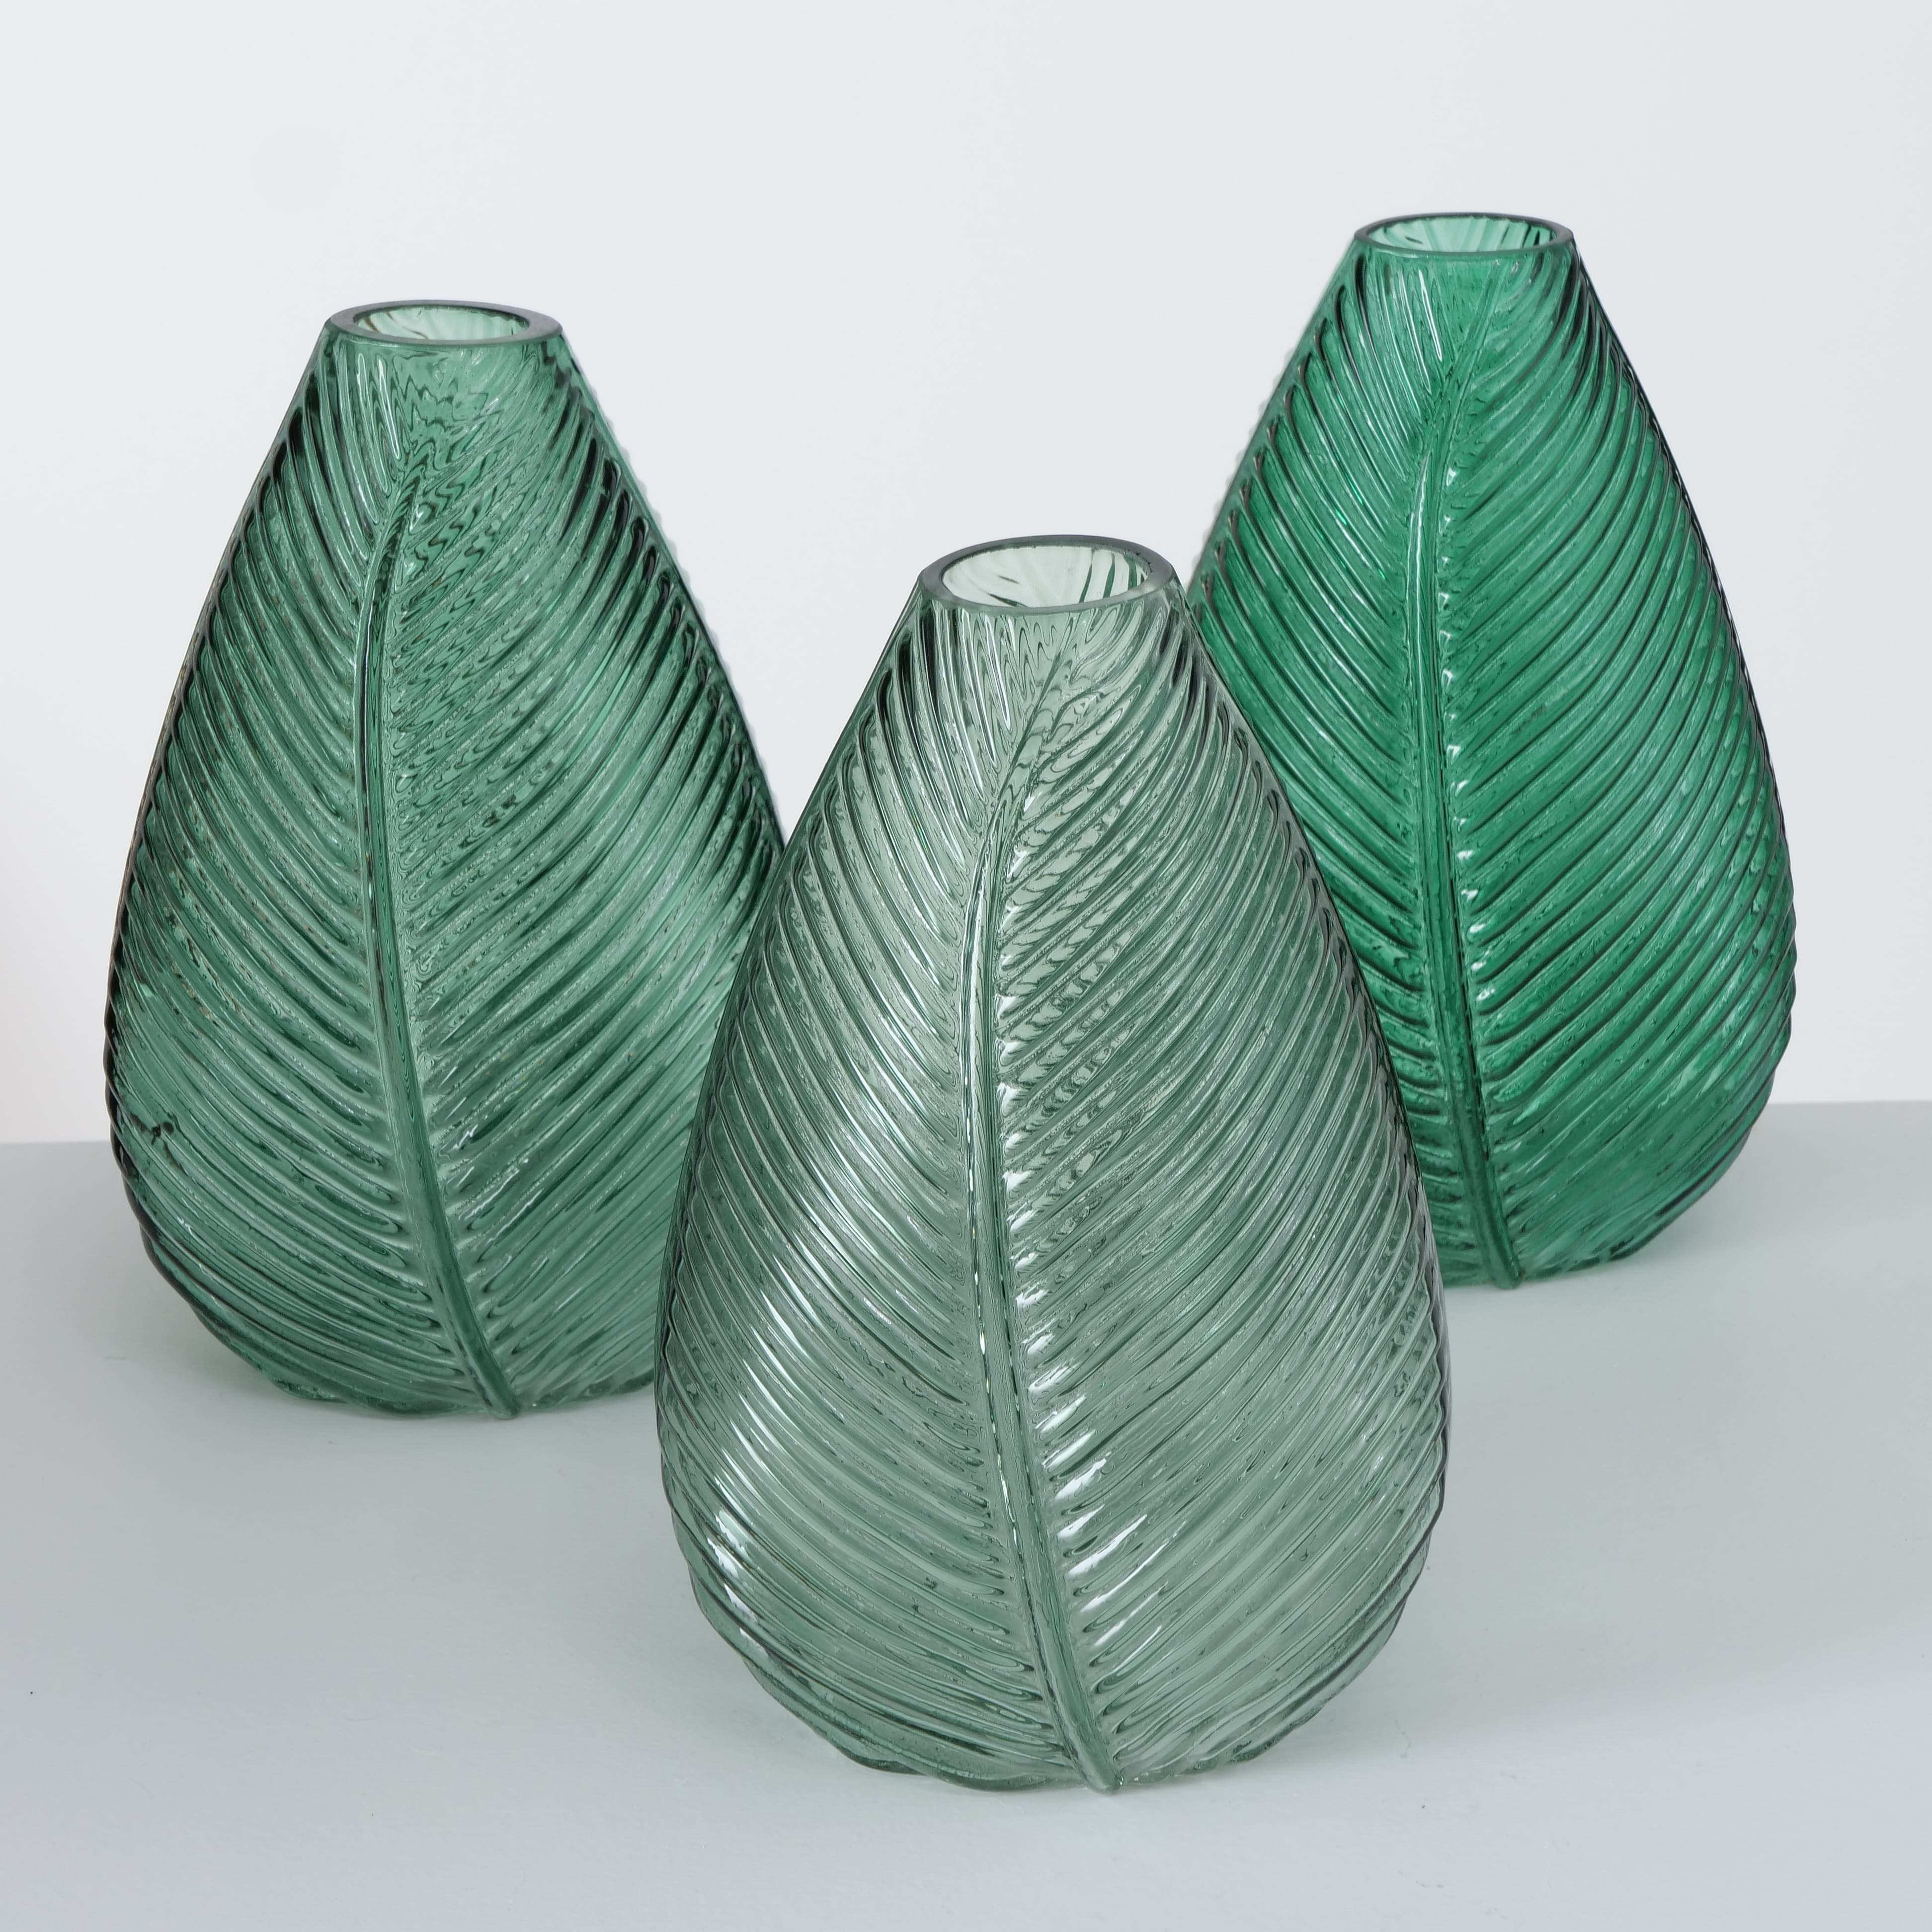 Vaza decorativa din sticla Lewin Verde, Modele Asortate, L14xl13xH22 cm poza